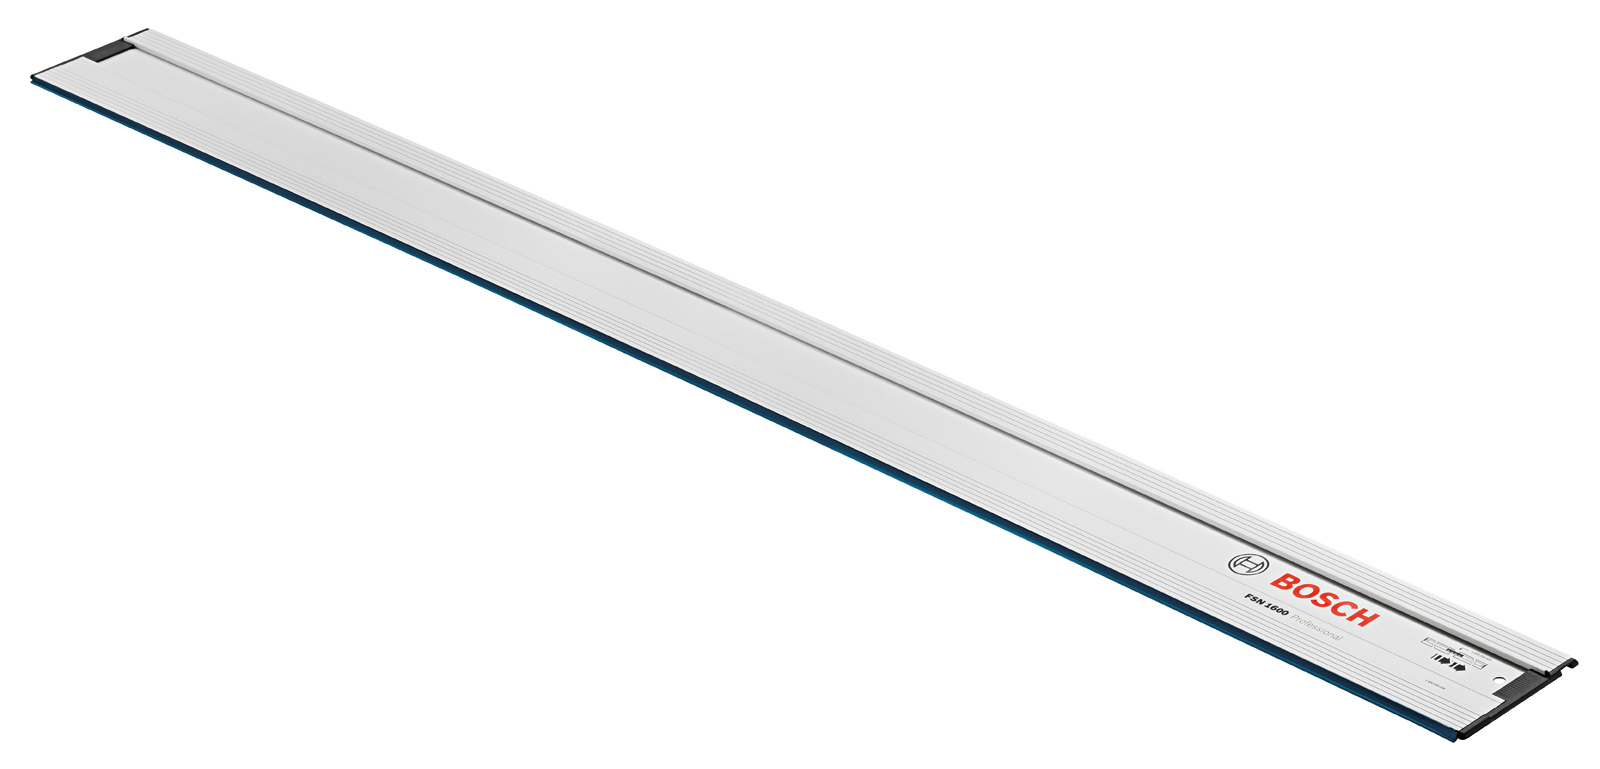 цена на Шина направляющая Bosch Fsn 1600 (1.600.z00.00f)